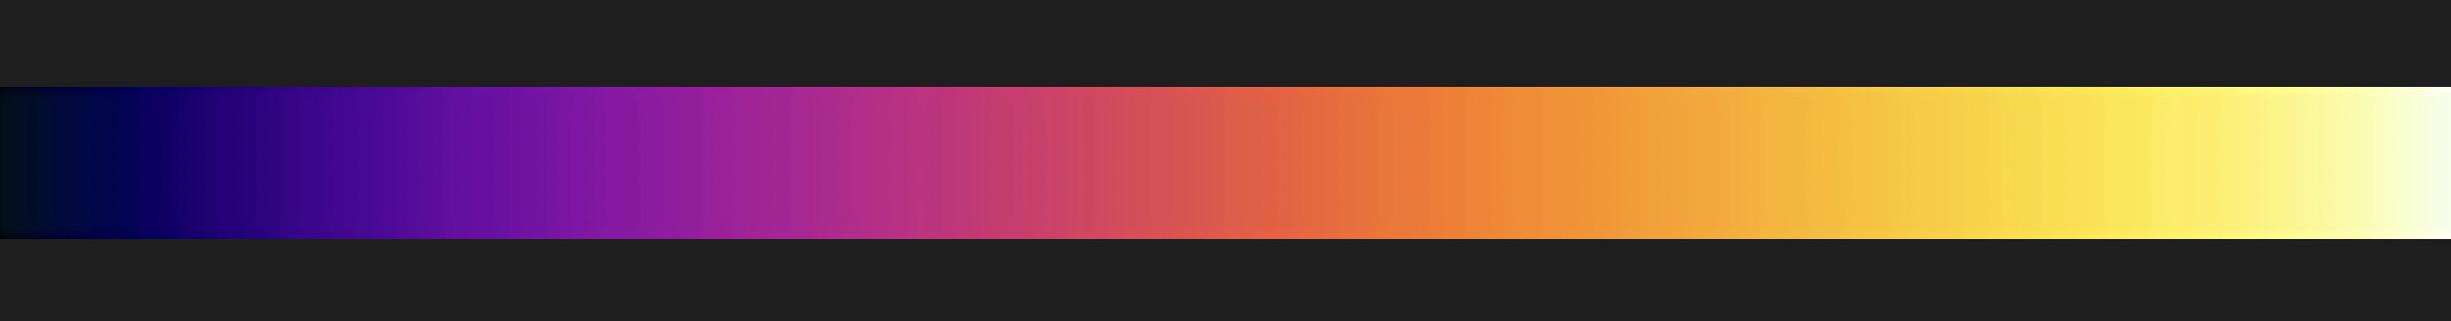 temperature___humidity_iron_spectrum_ref_short.jpeg